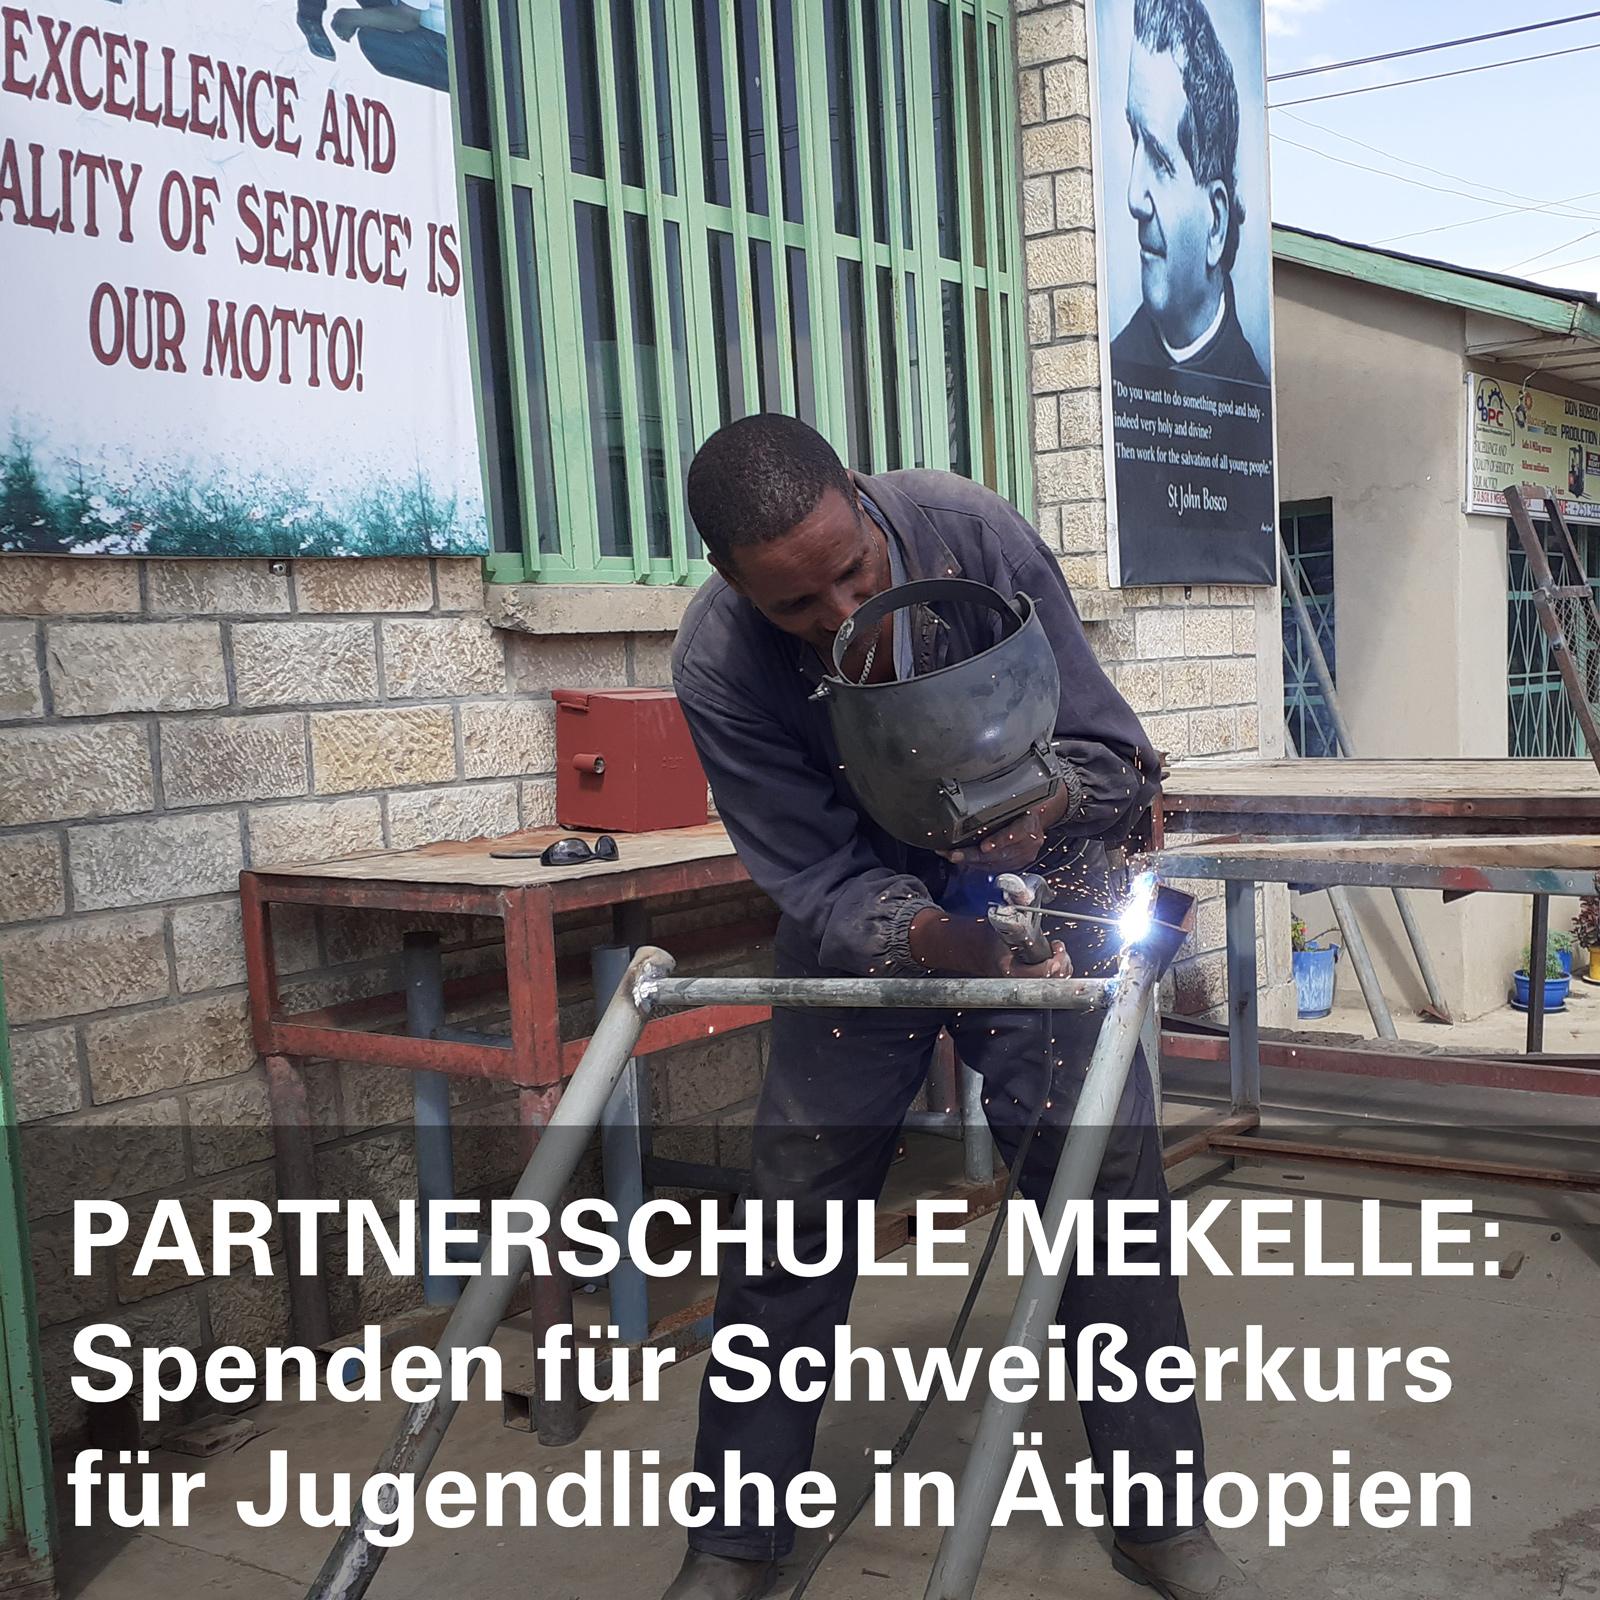 Partnerschule in Äthiopien